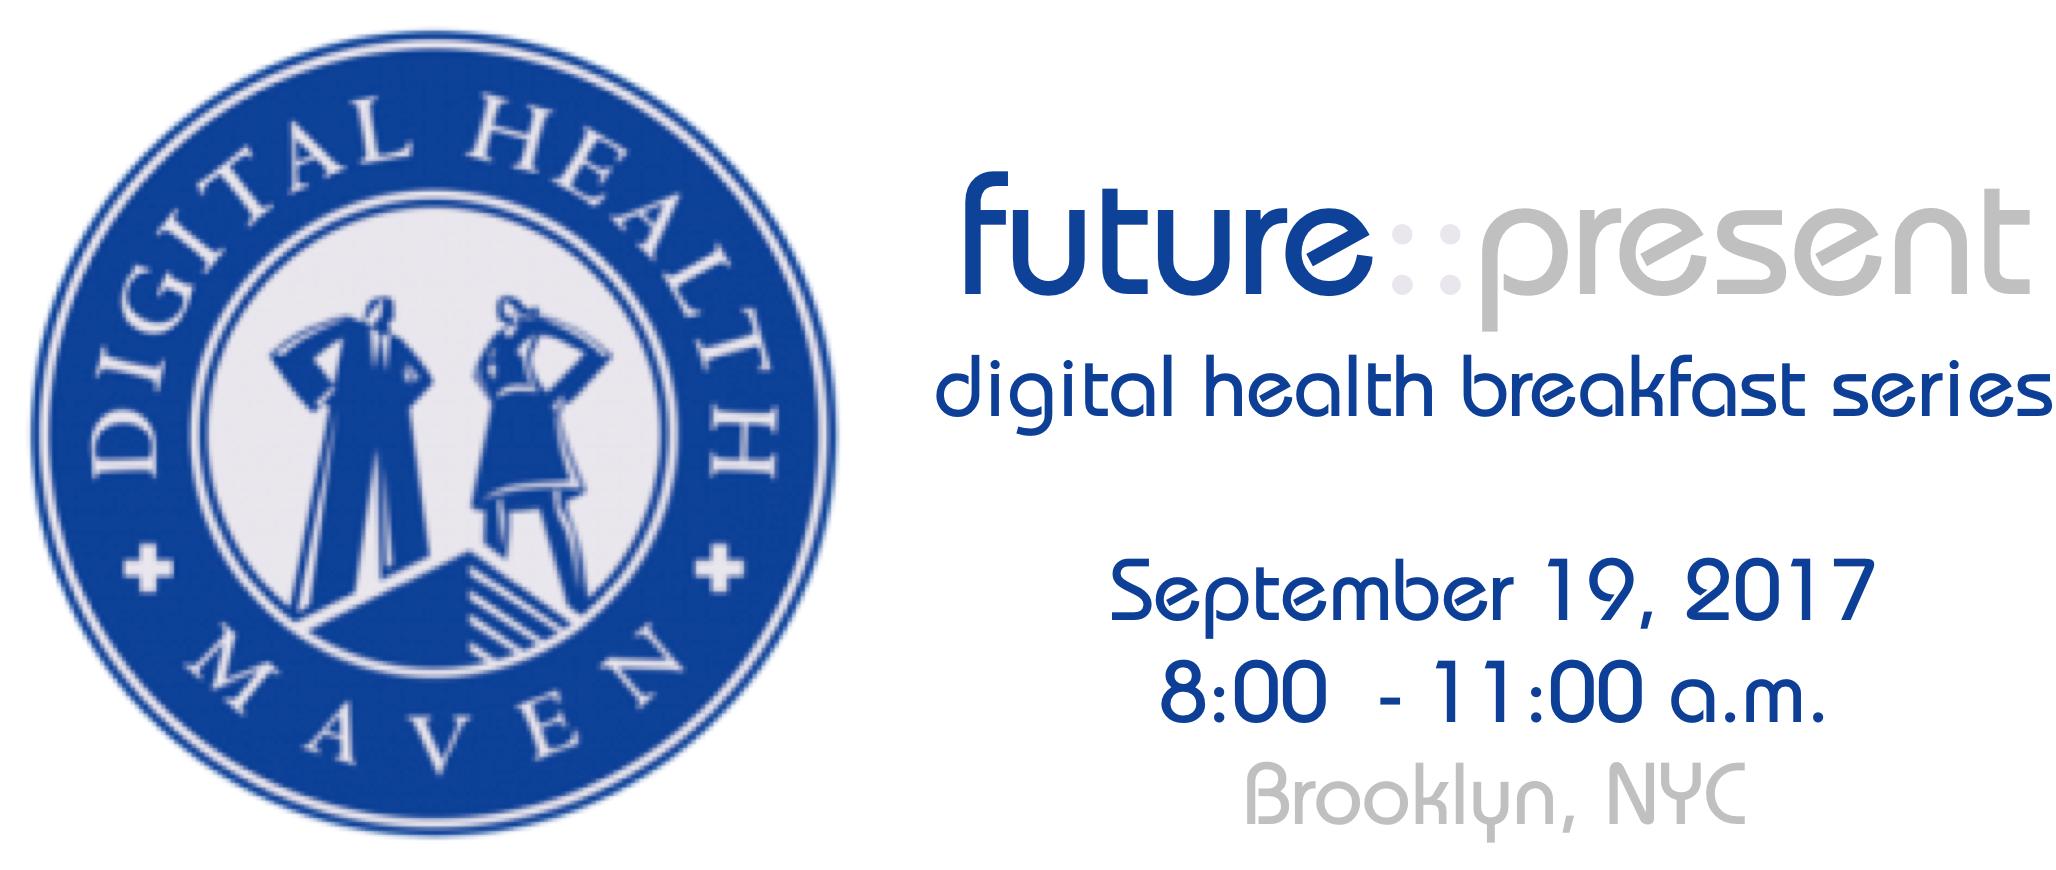 future::present event logo